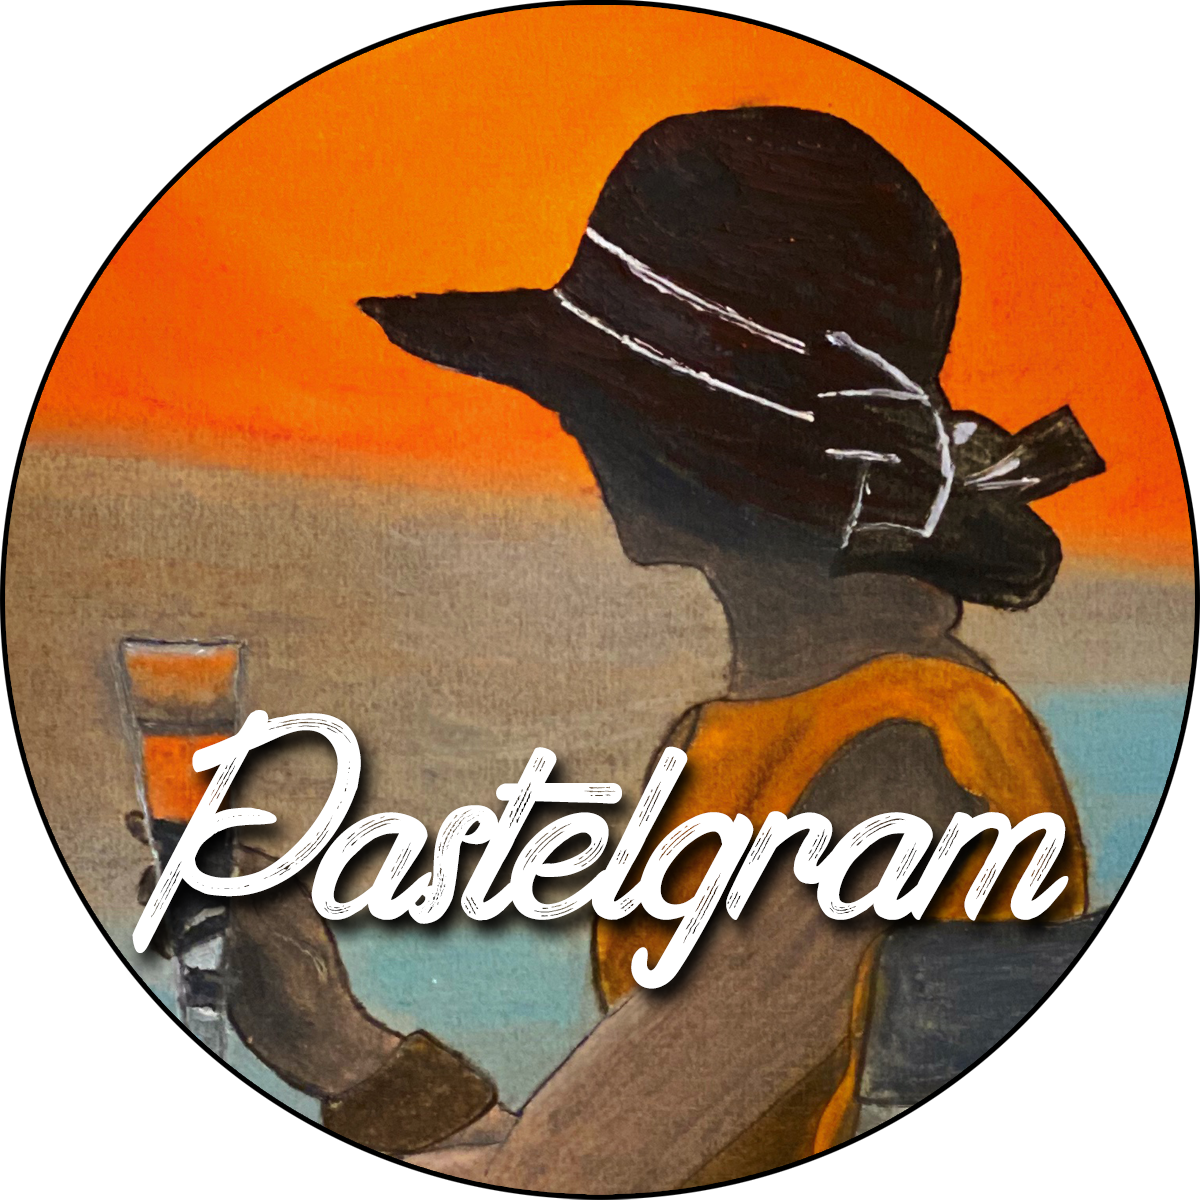 https://www.jatszohaz.hu/wp-content/uploads/2021/04/pastergram_circle_logo.png